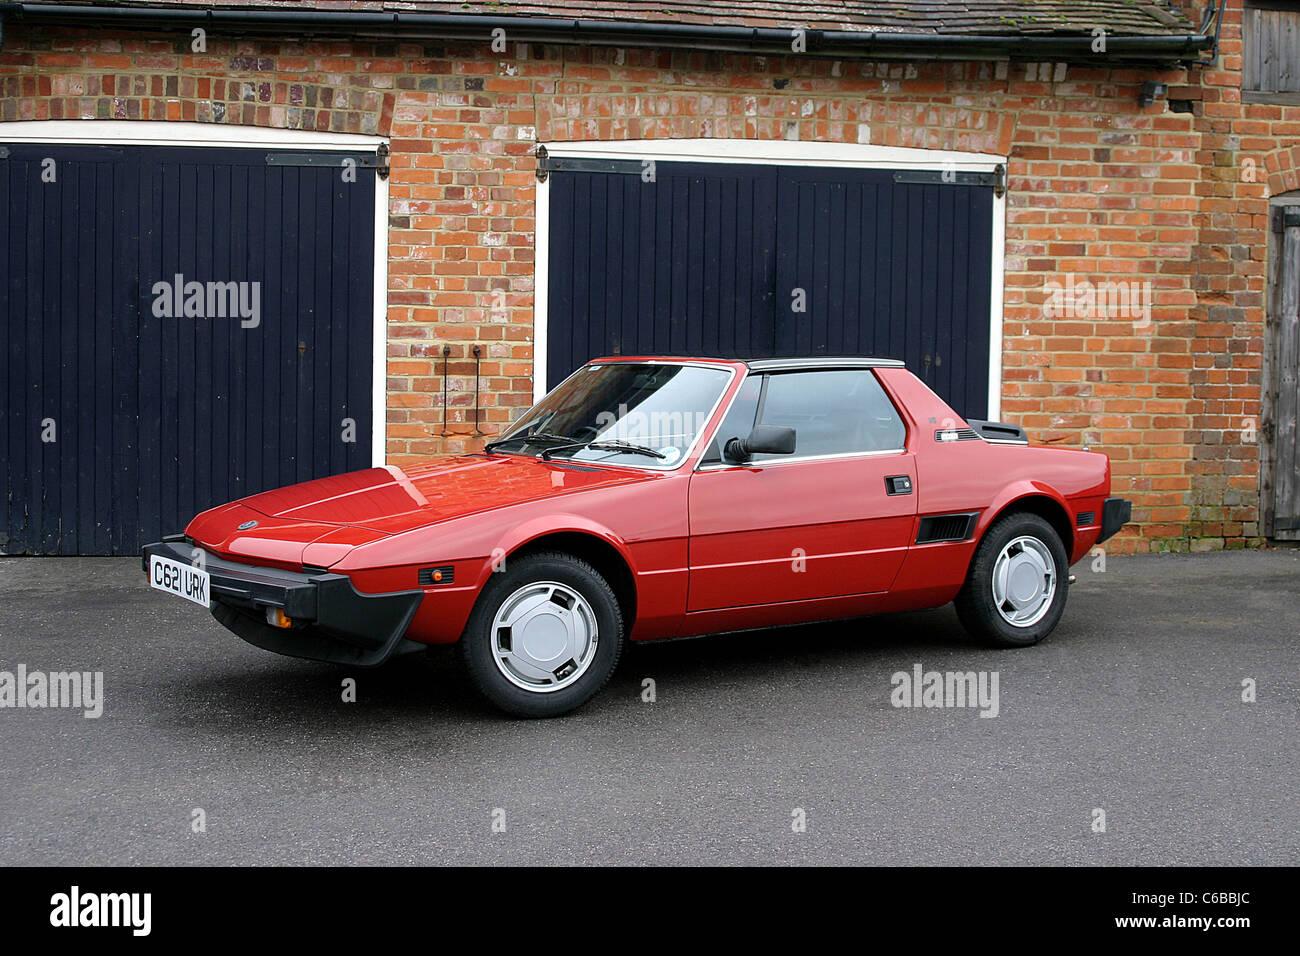 1986 Fiat X1/9 VS Stock Photo